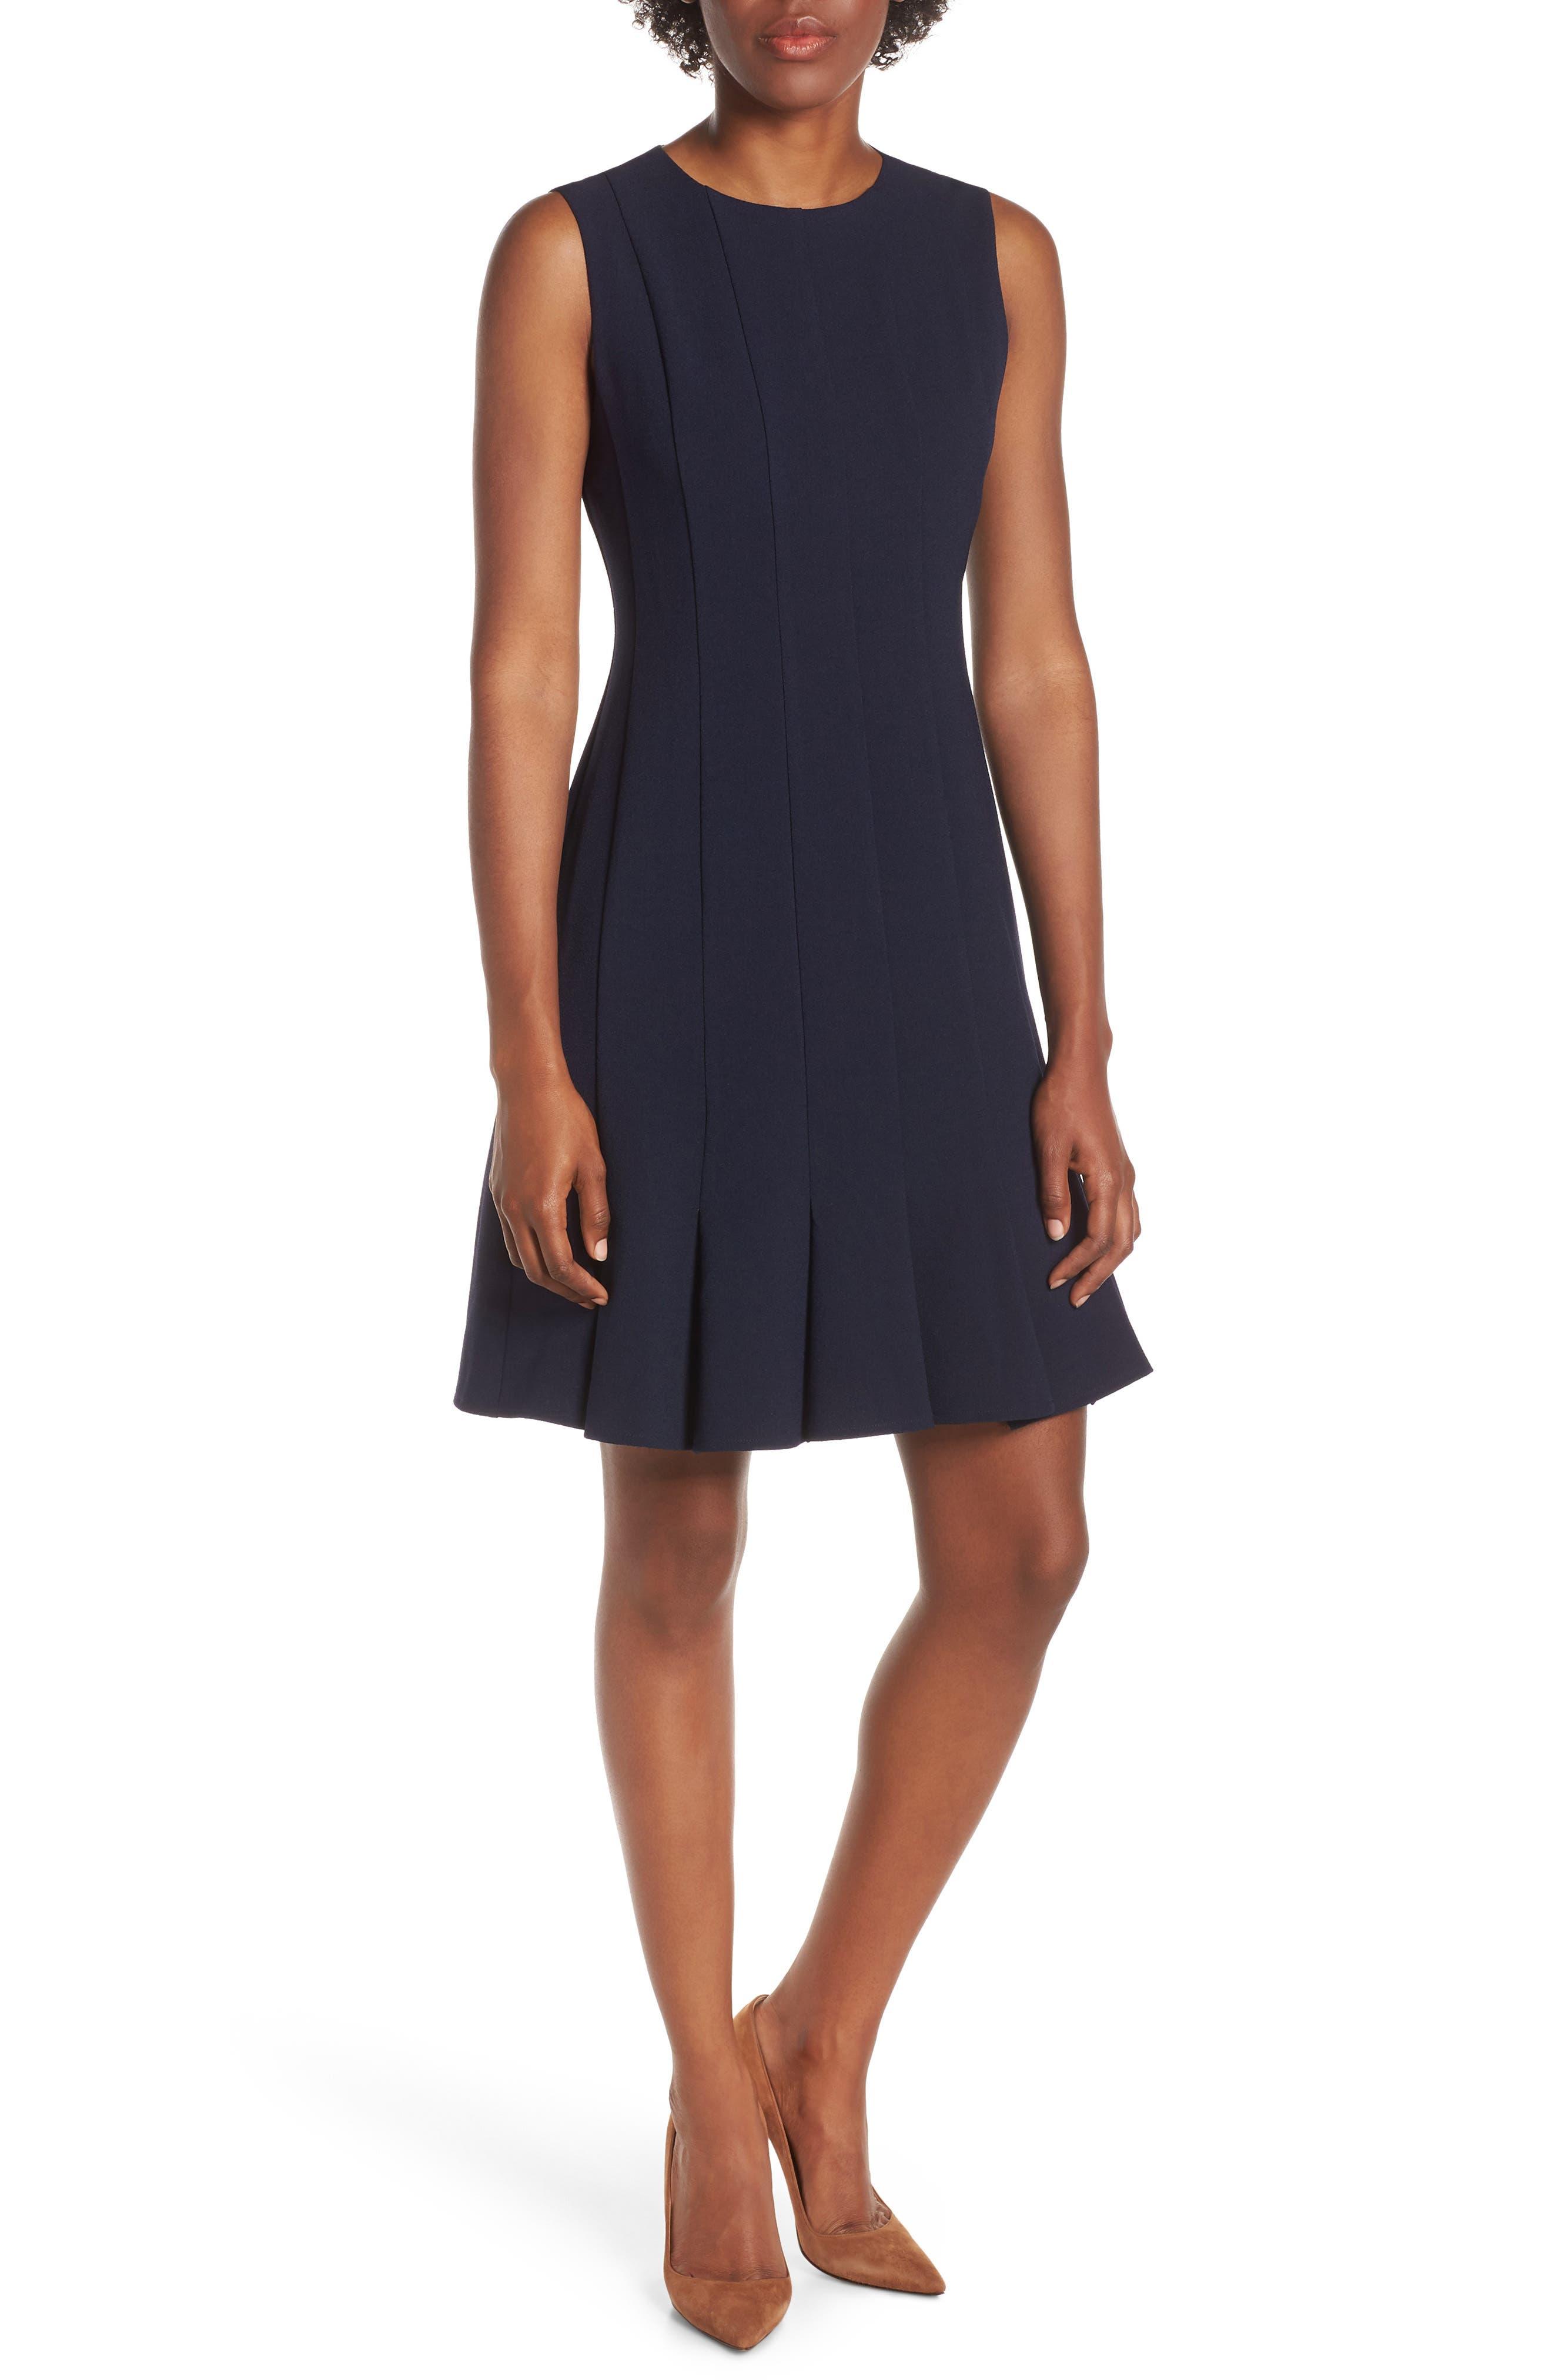 JULIA JORDAN Sleeveless Pleat Panel Fit & Flare Dress, Main, color, NAVY